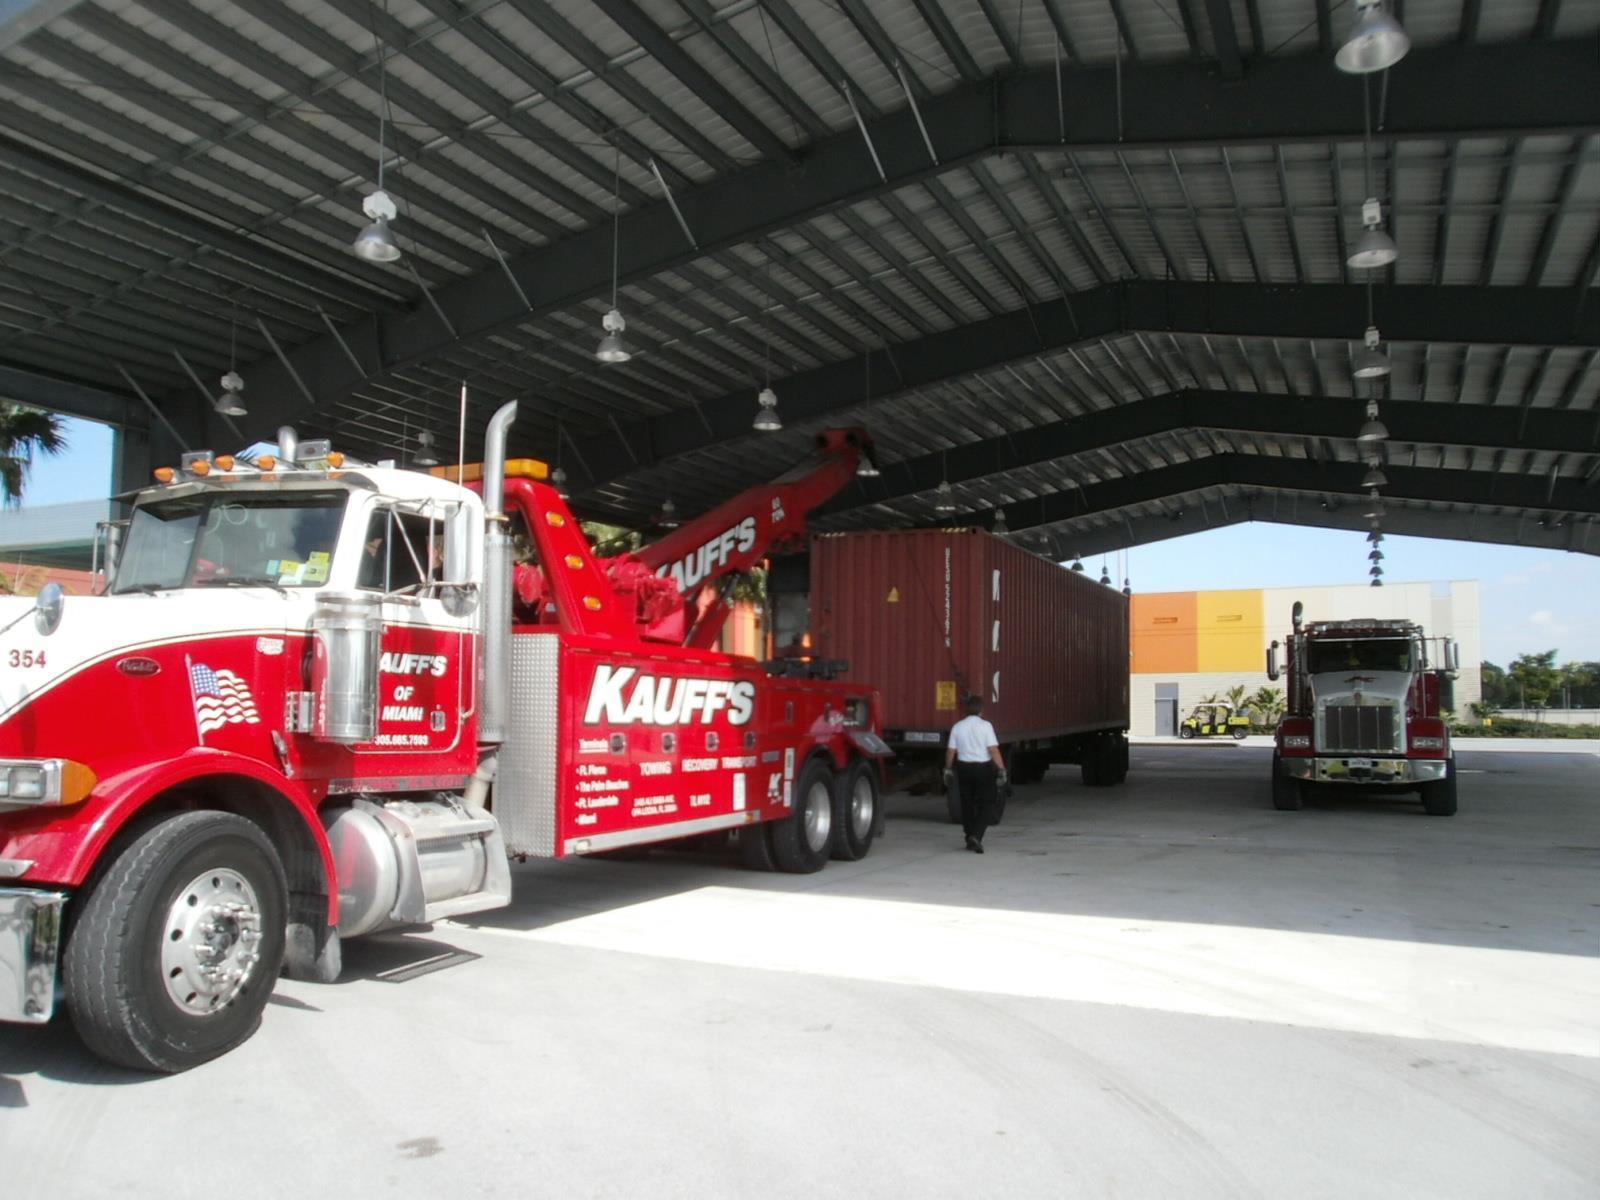 Kauff's Transportation Systems image 3